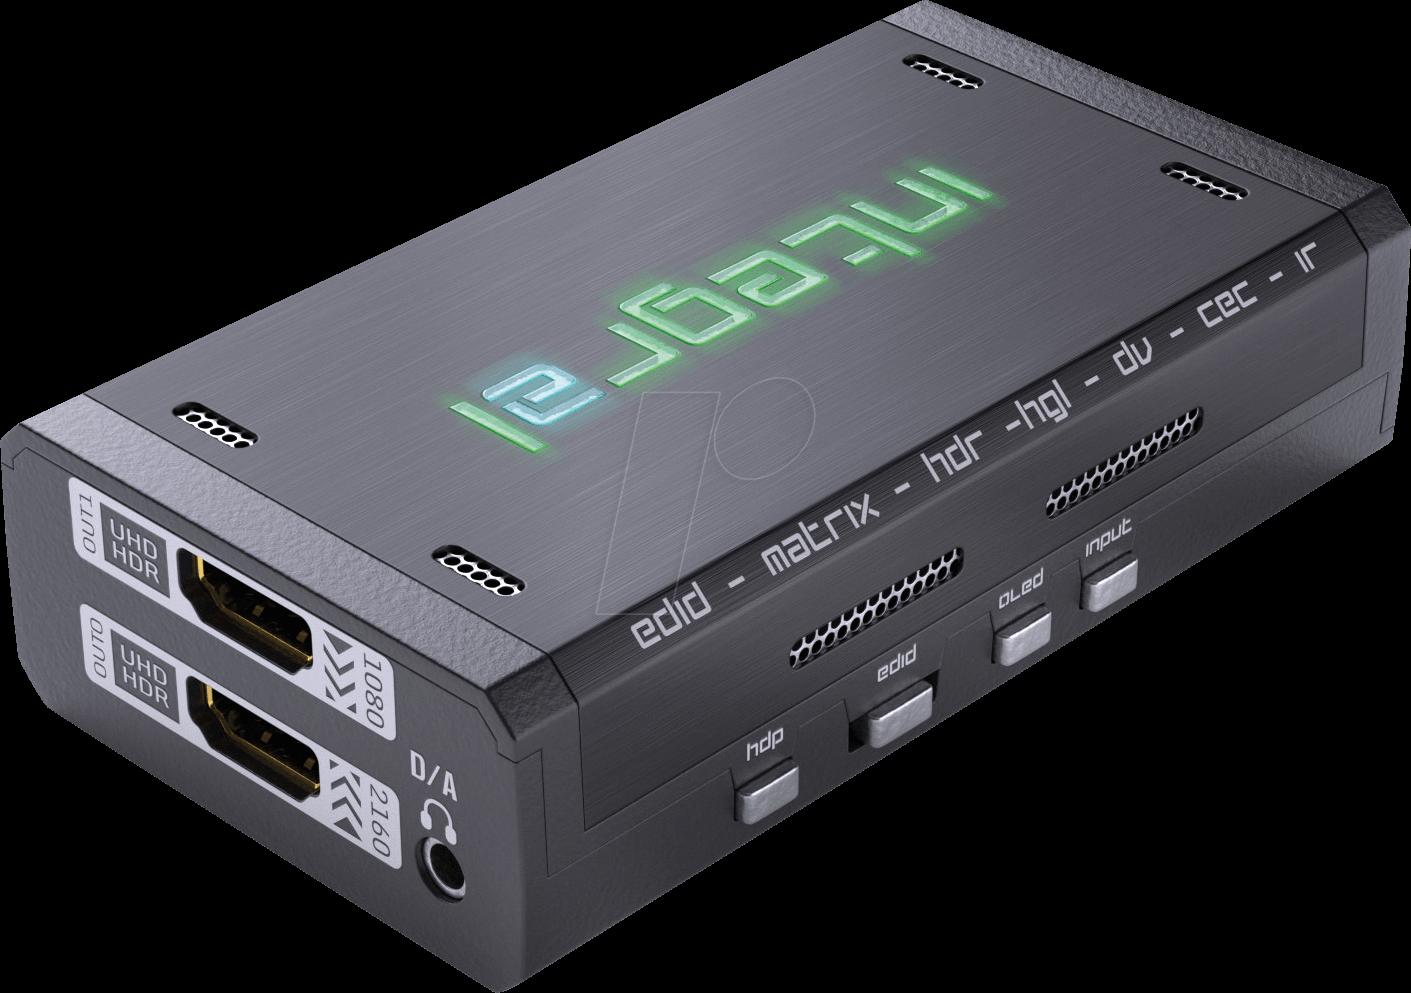 HDF 0120 - HDFury 4K Integral 2, HDMI Splitter/Switcher